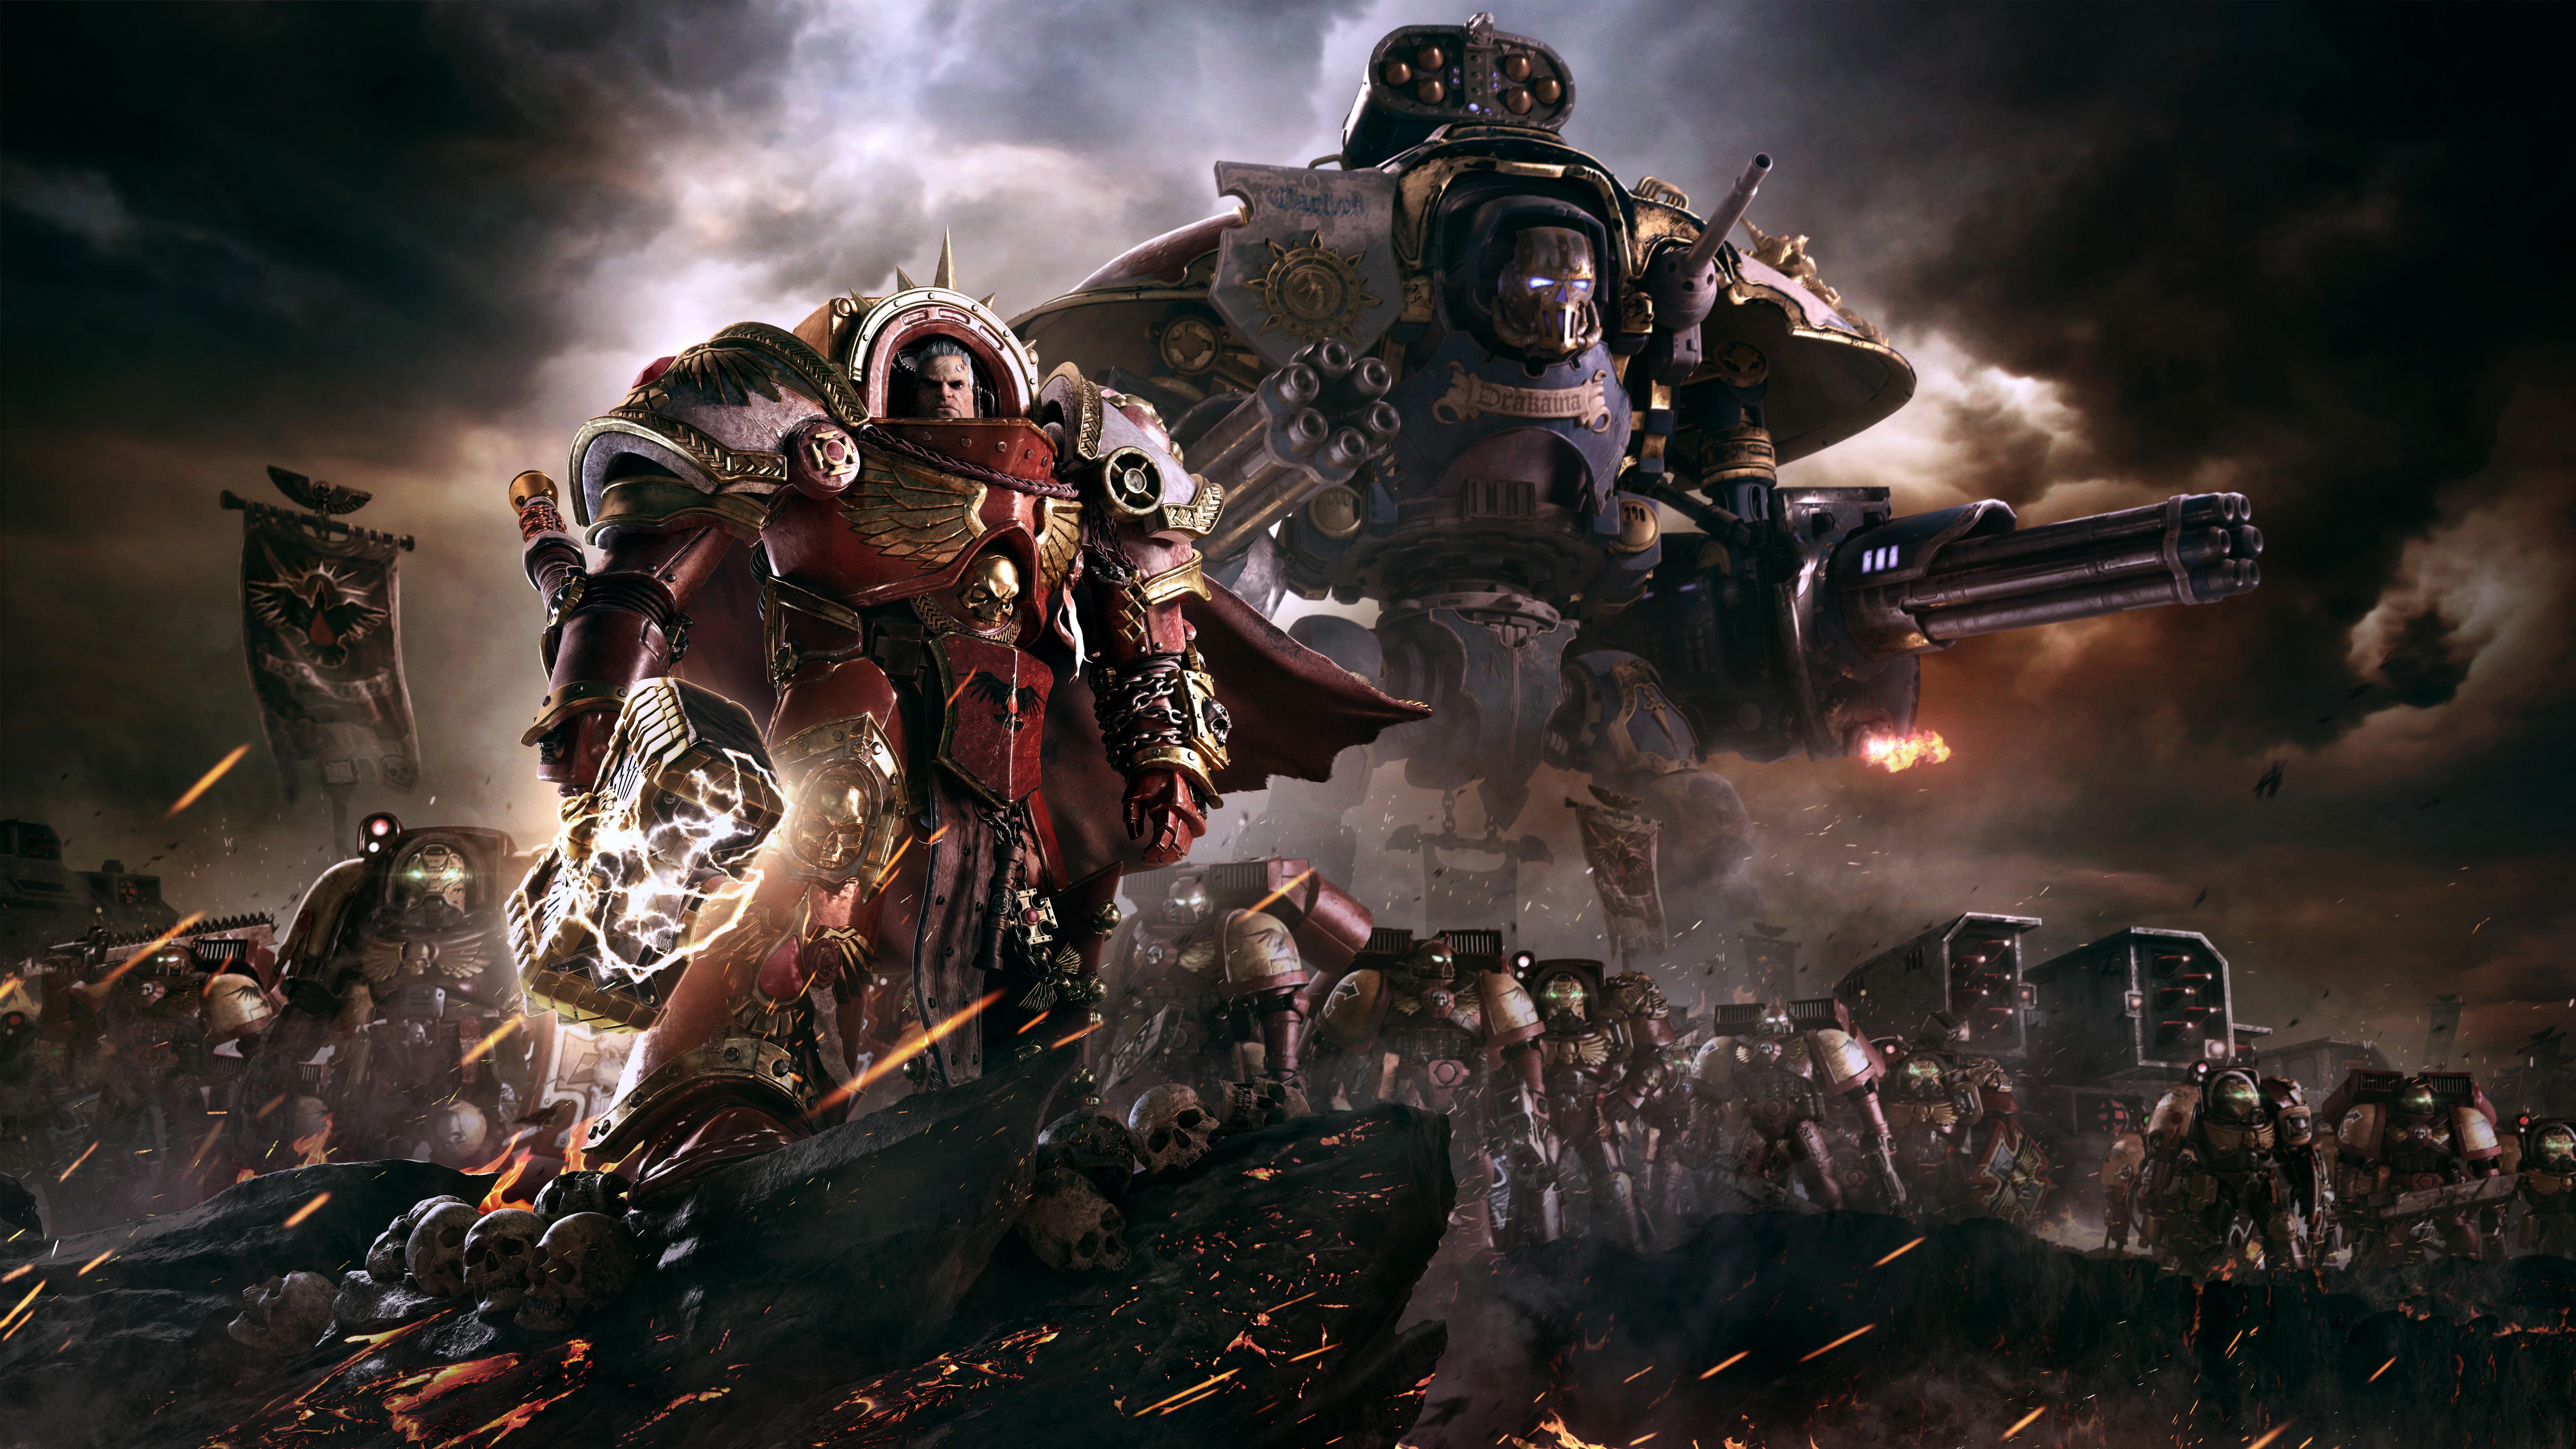 warhammer 40000 dawn of war iii 8k wallpaper